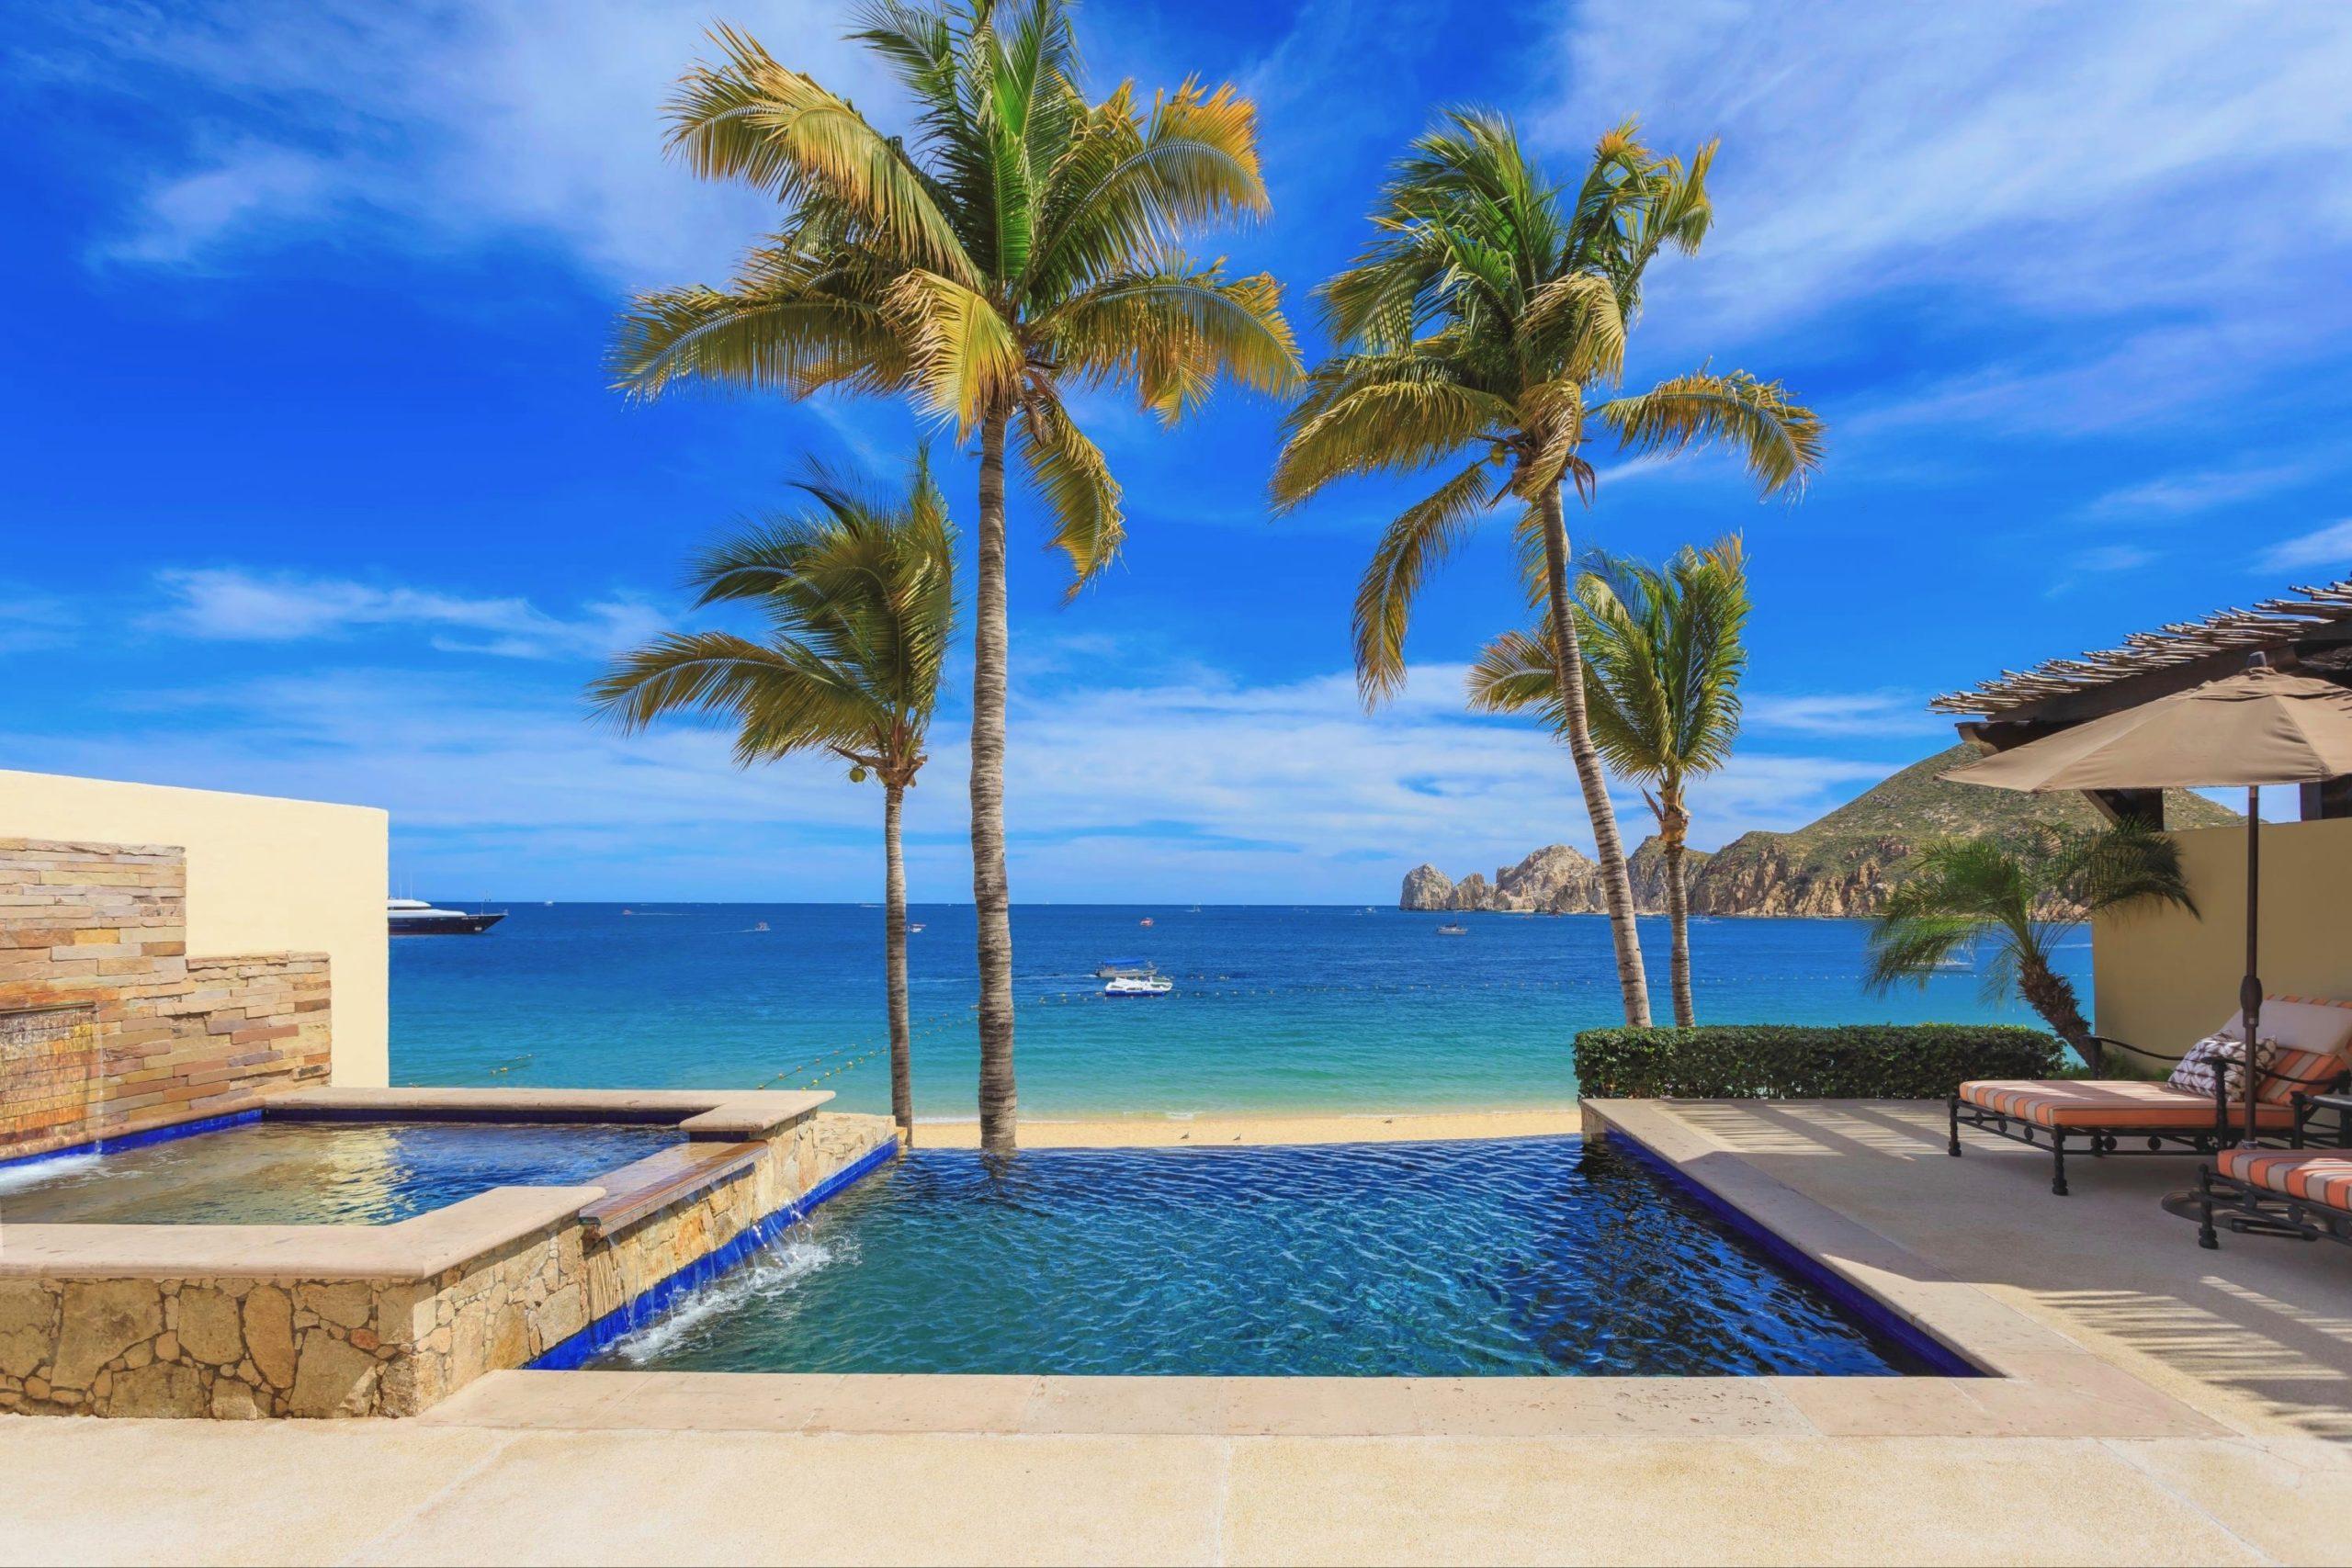 A view of Medano beach from a villa in Hacienda